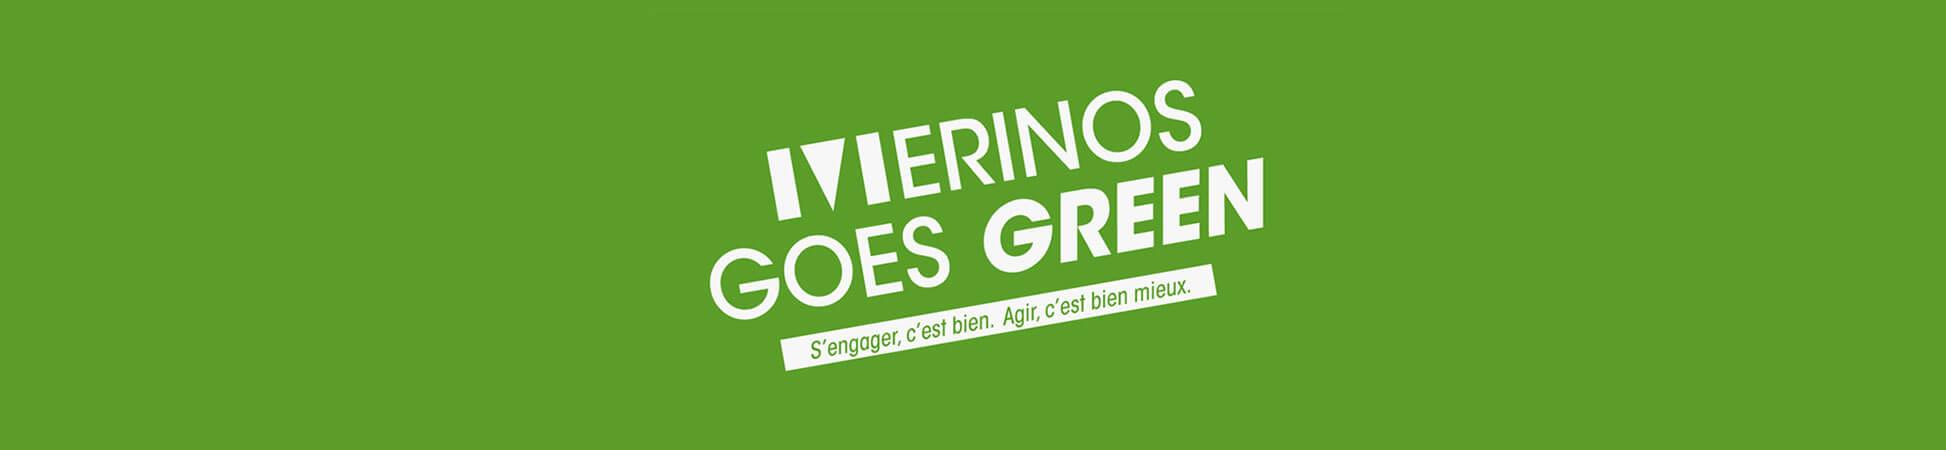 Merinos engagements verts